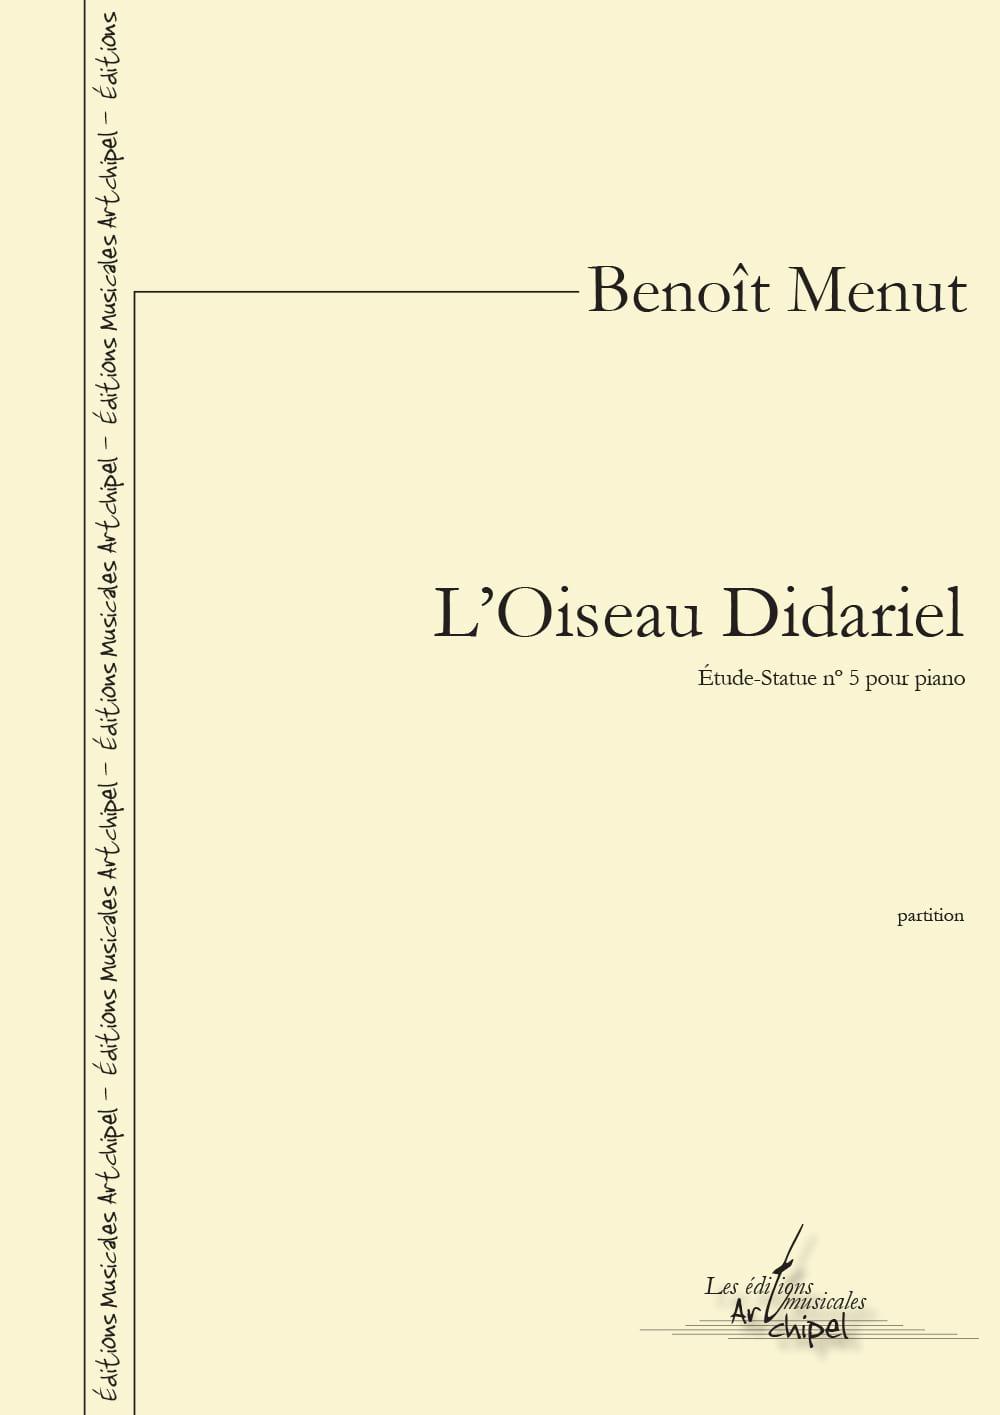 L'Oiseau Didariel - Benoît Menut - Partition - laflutedepan.com